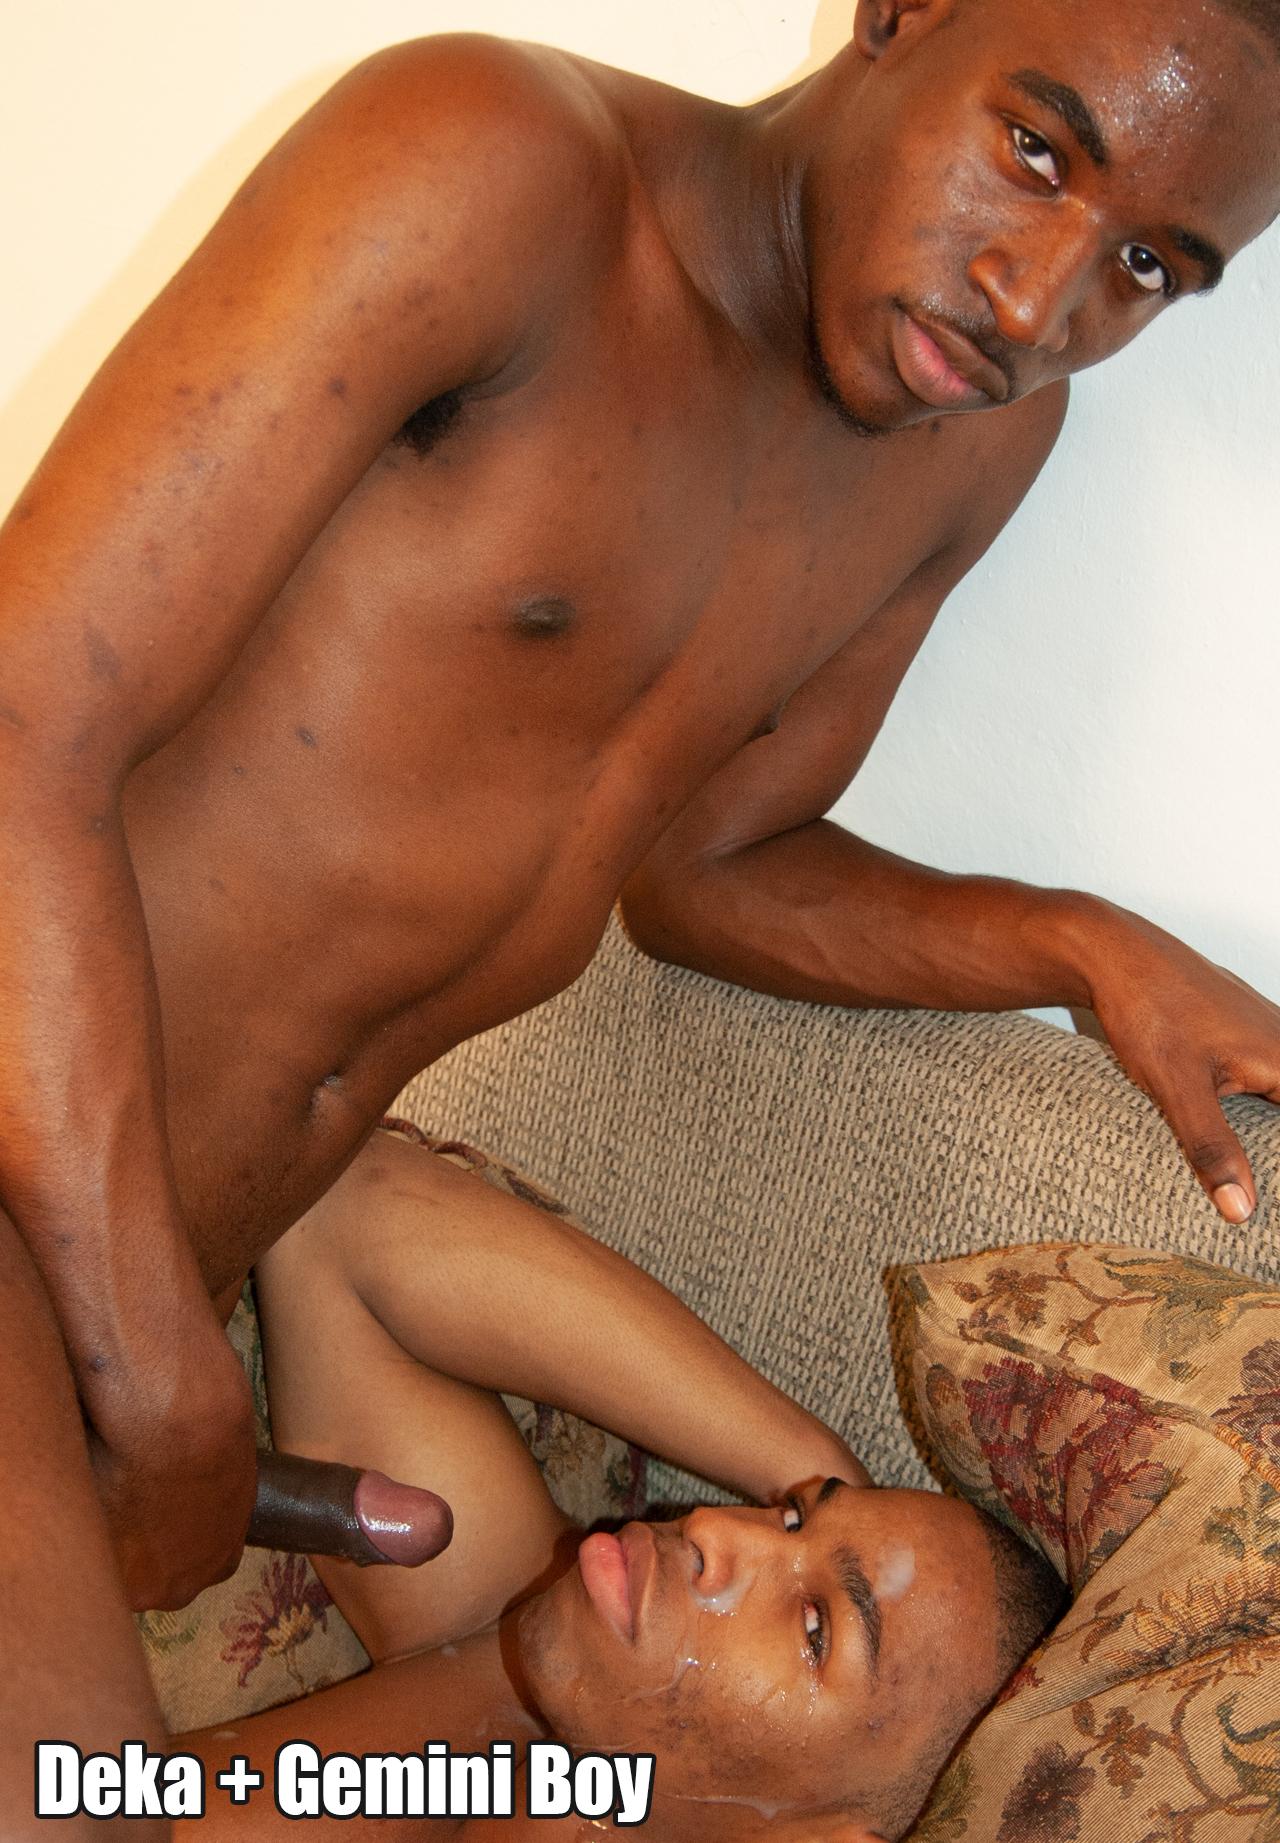 Deka & Gemini Boy